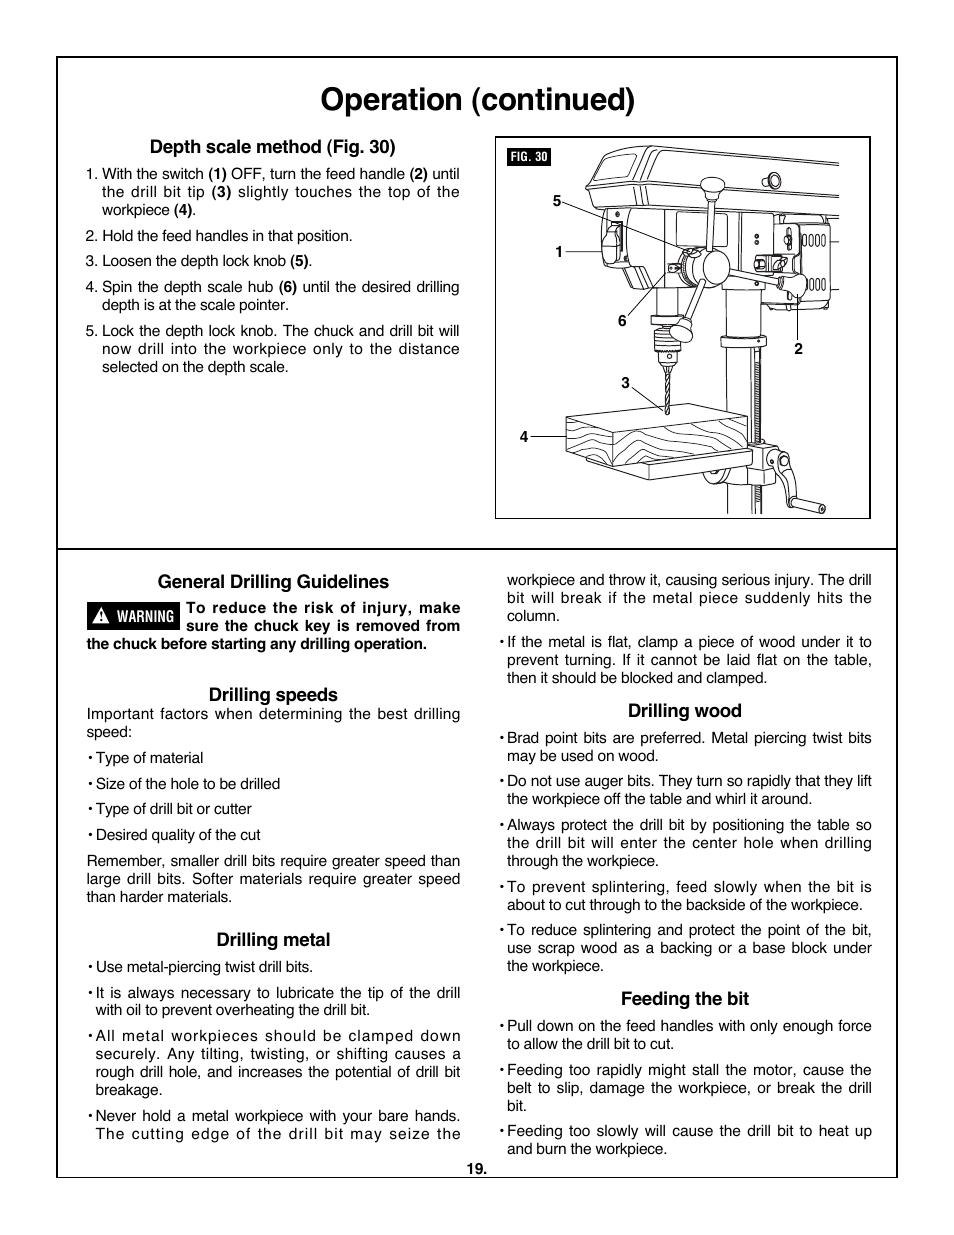 operation continued skil 3320 01 user manual page 19 60 rh manualsdir com